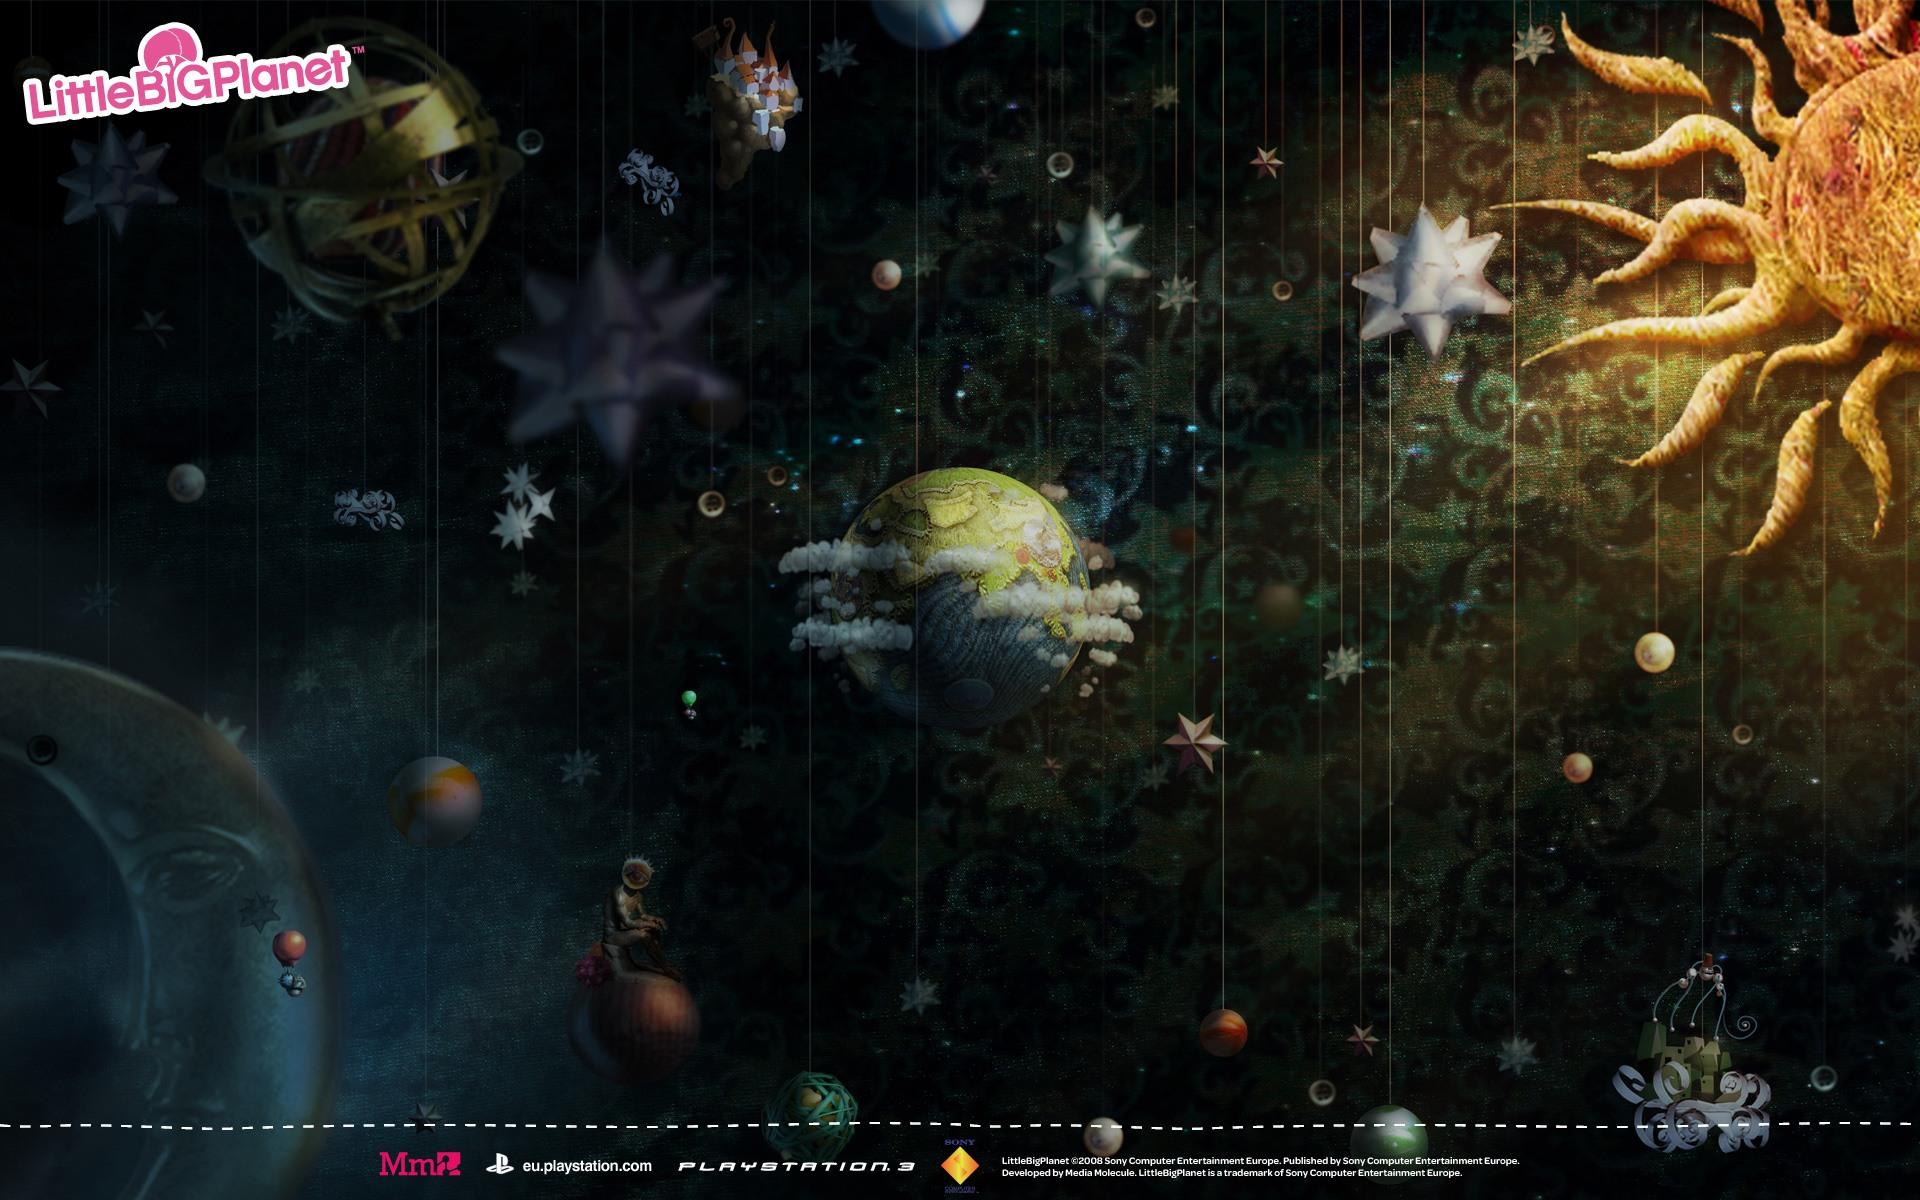 графика игры The Little Big Planet graphics game  № 1878141 бесплатно